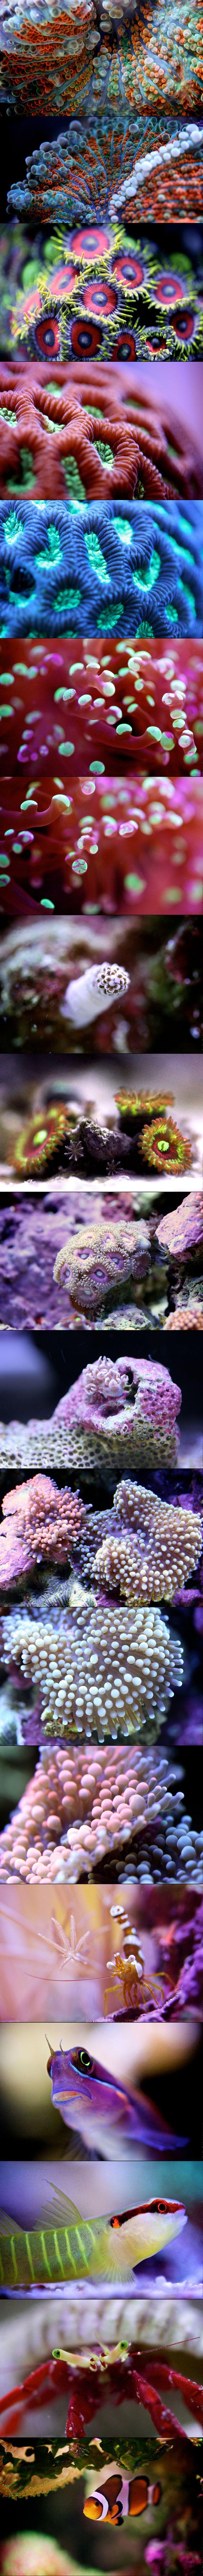 MACRO REEF DWELLERS: A RETROSPECTIVE by Felix Salazar #LostOcean Colour palette inspiration!